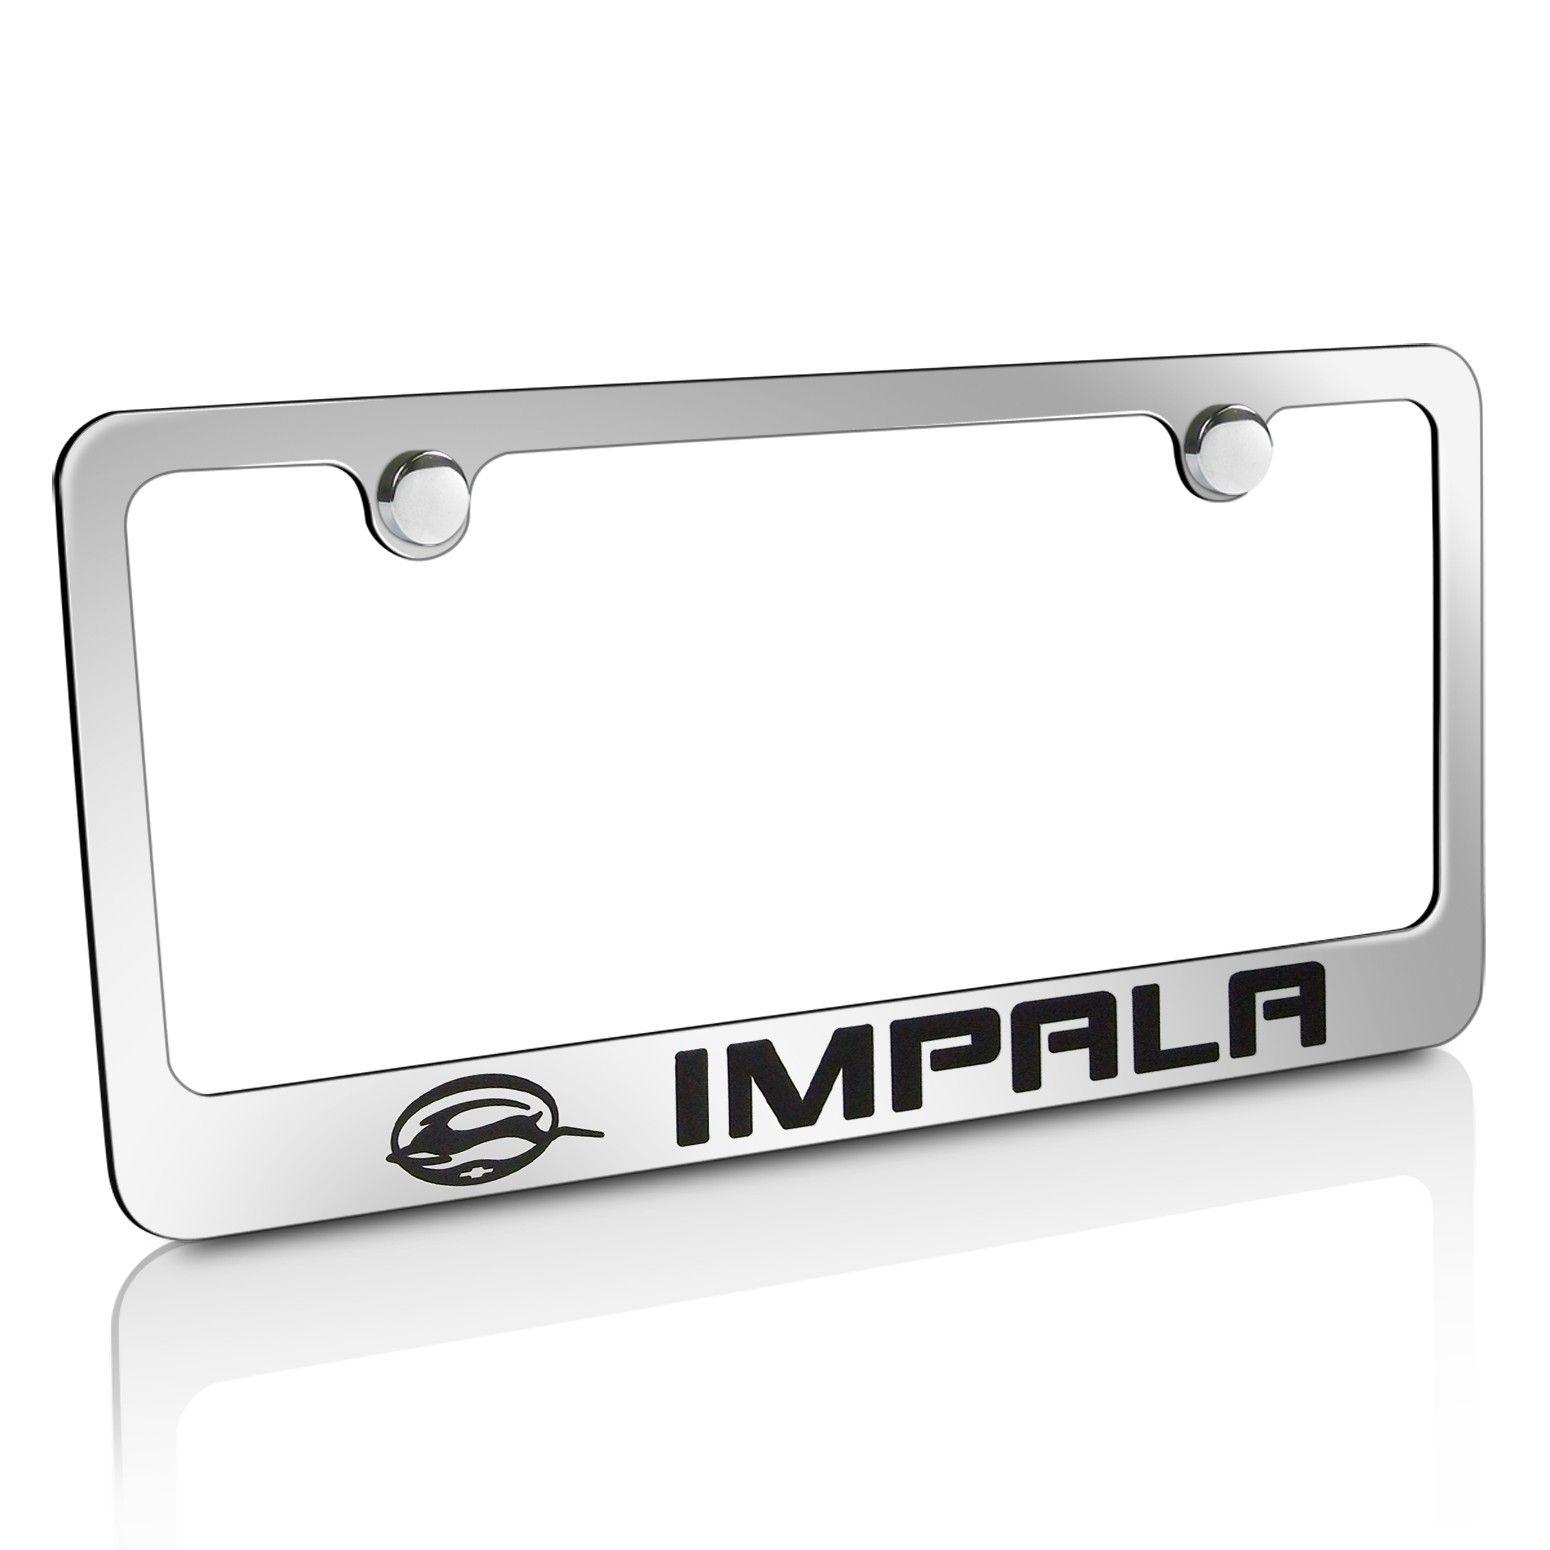 Chevrolet Impala Chrome Metal License Frame   EL-9030796   $27.45 ...